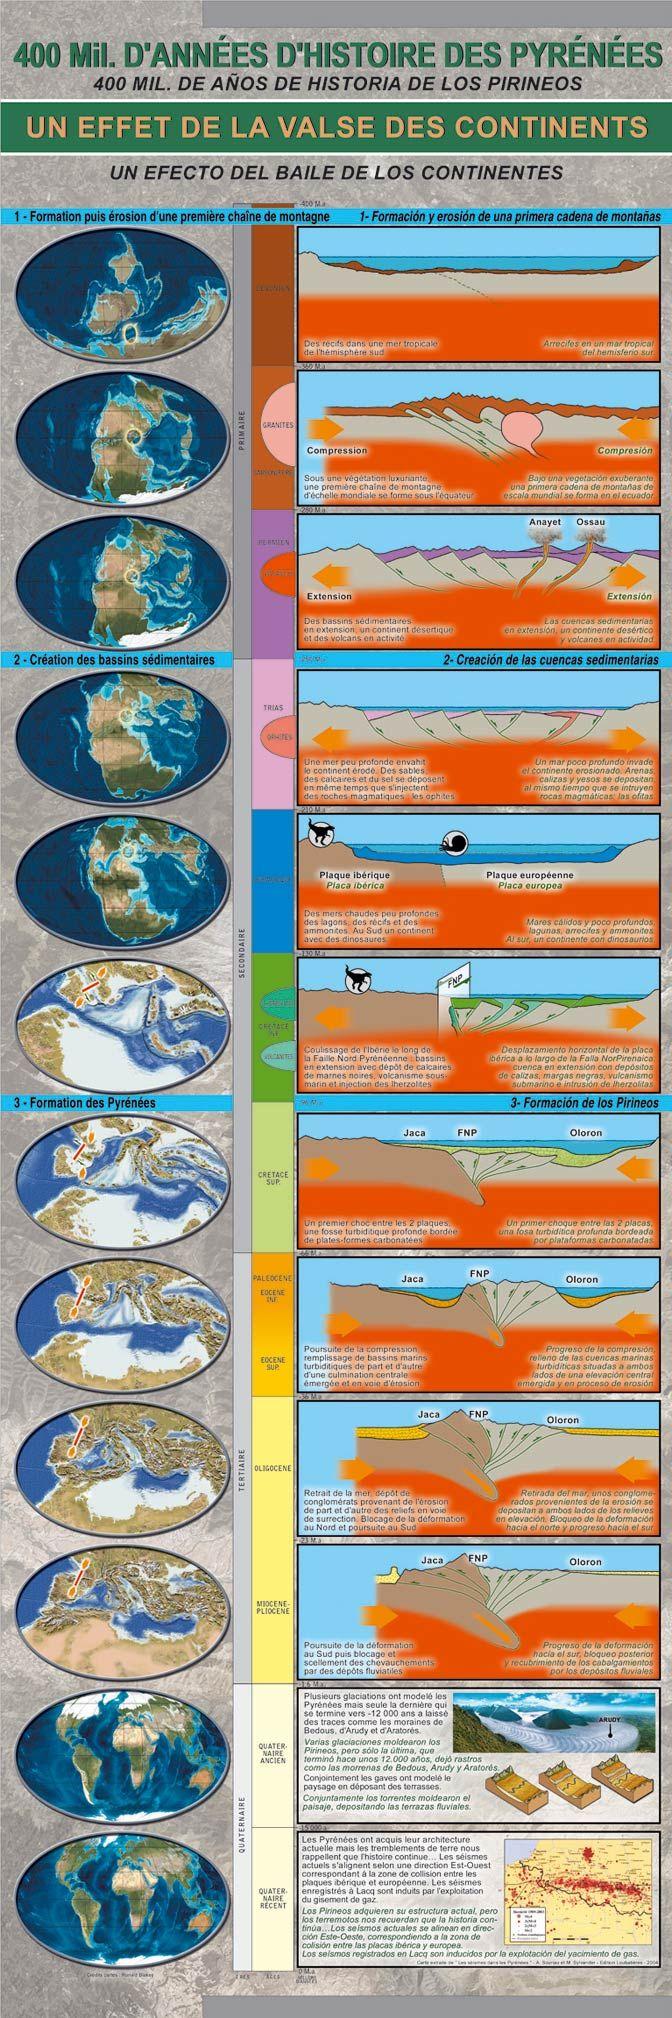 HISTORIA GEOLOGICA - Buscar con Google